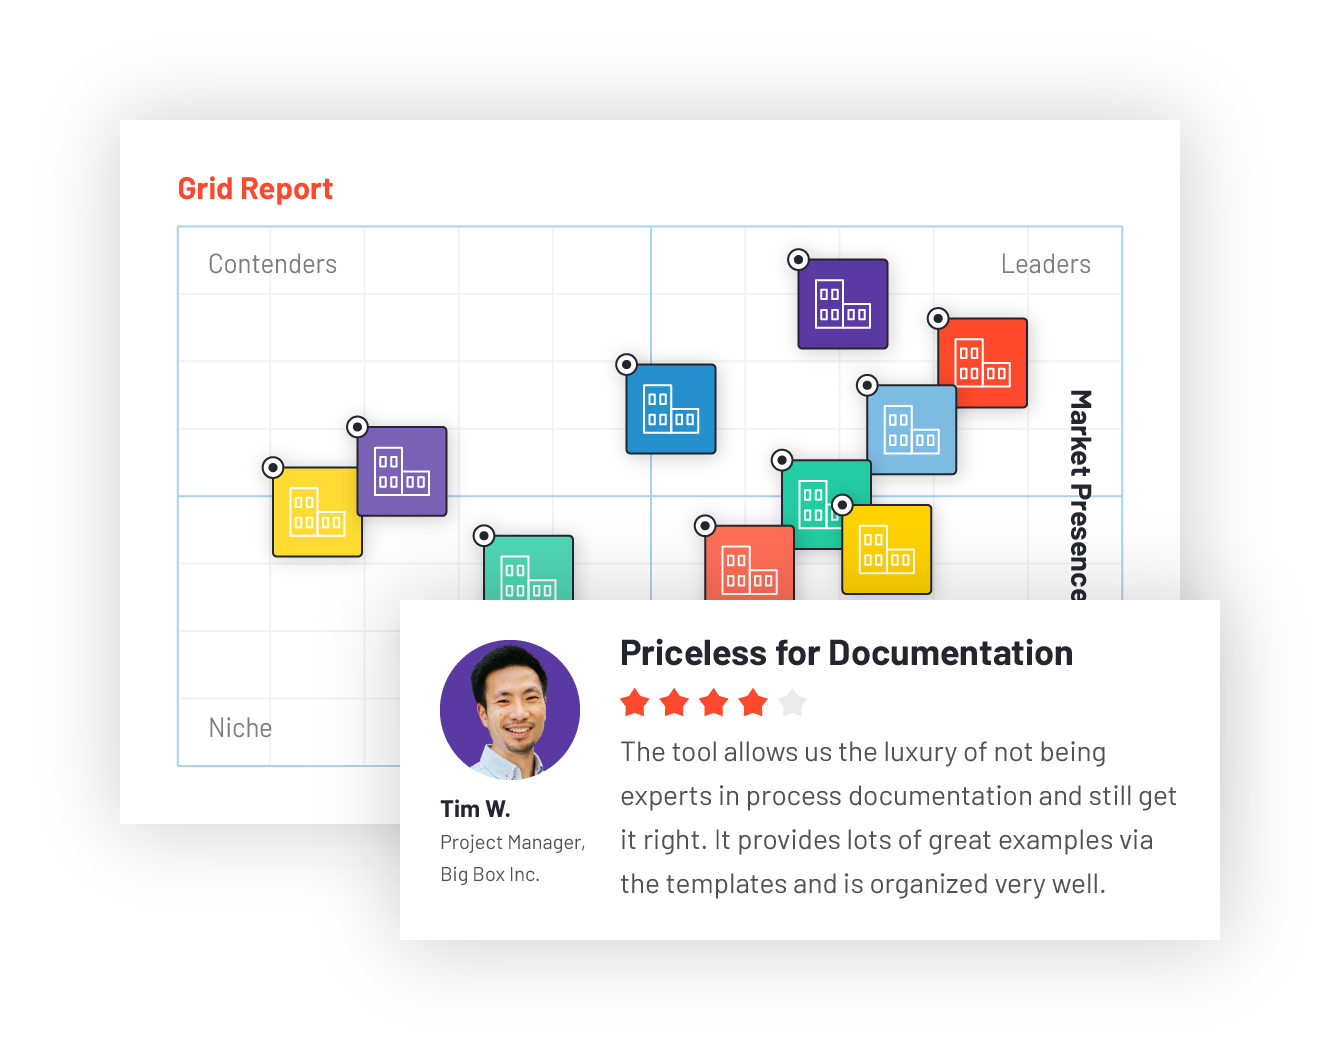 sell-screenshot-grid-report-review@2x